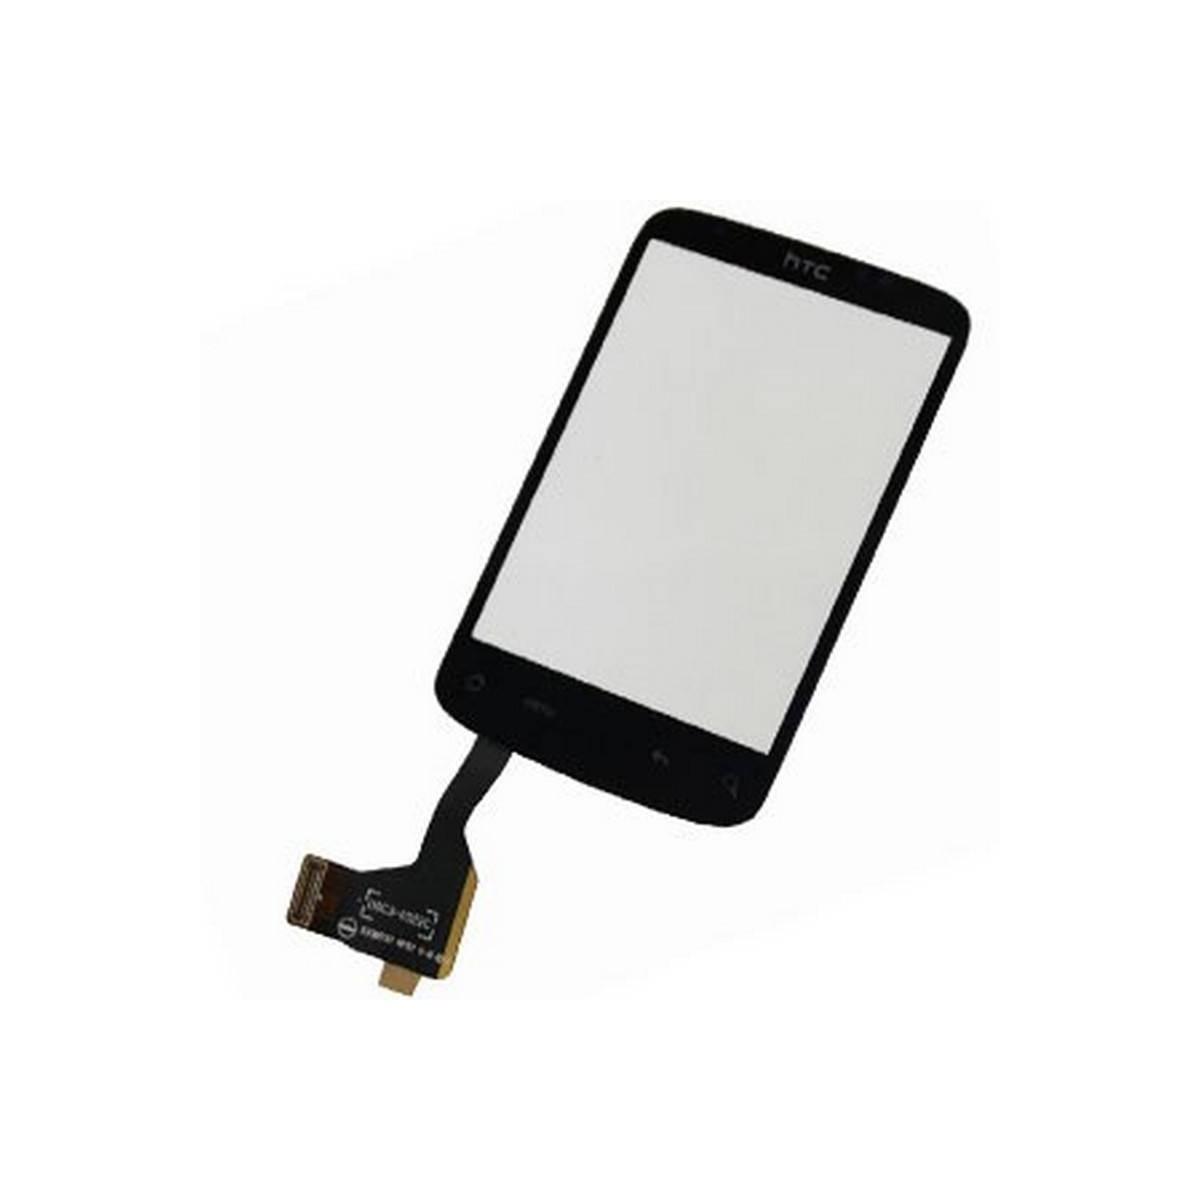 Pantalla táctil (Digitalizador) sin chip de HTC Wildfire A3333, Google G8